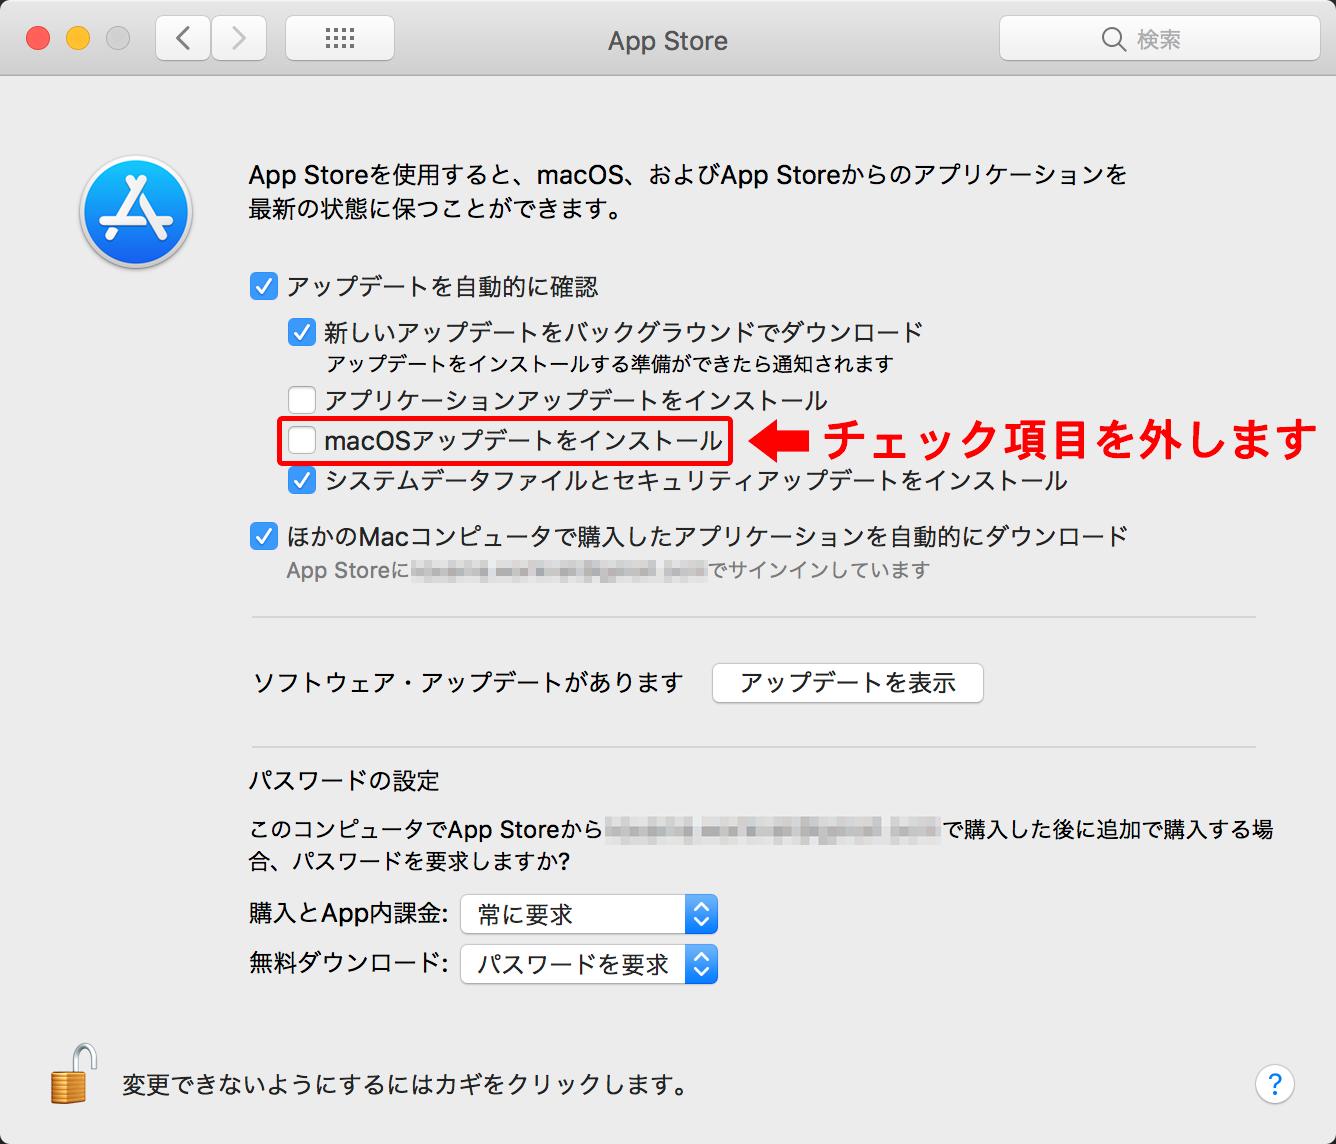 macOSの自動アップデートをオフに設定する方法